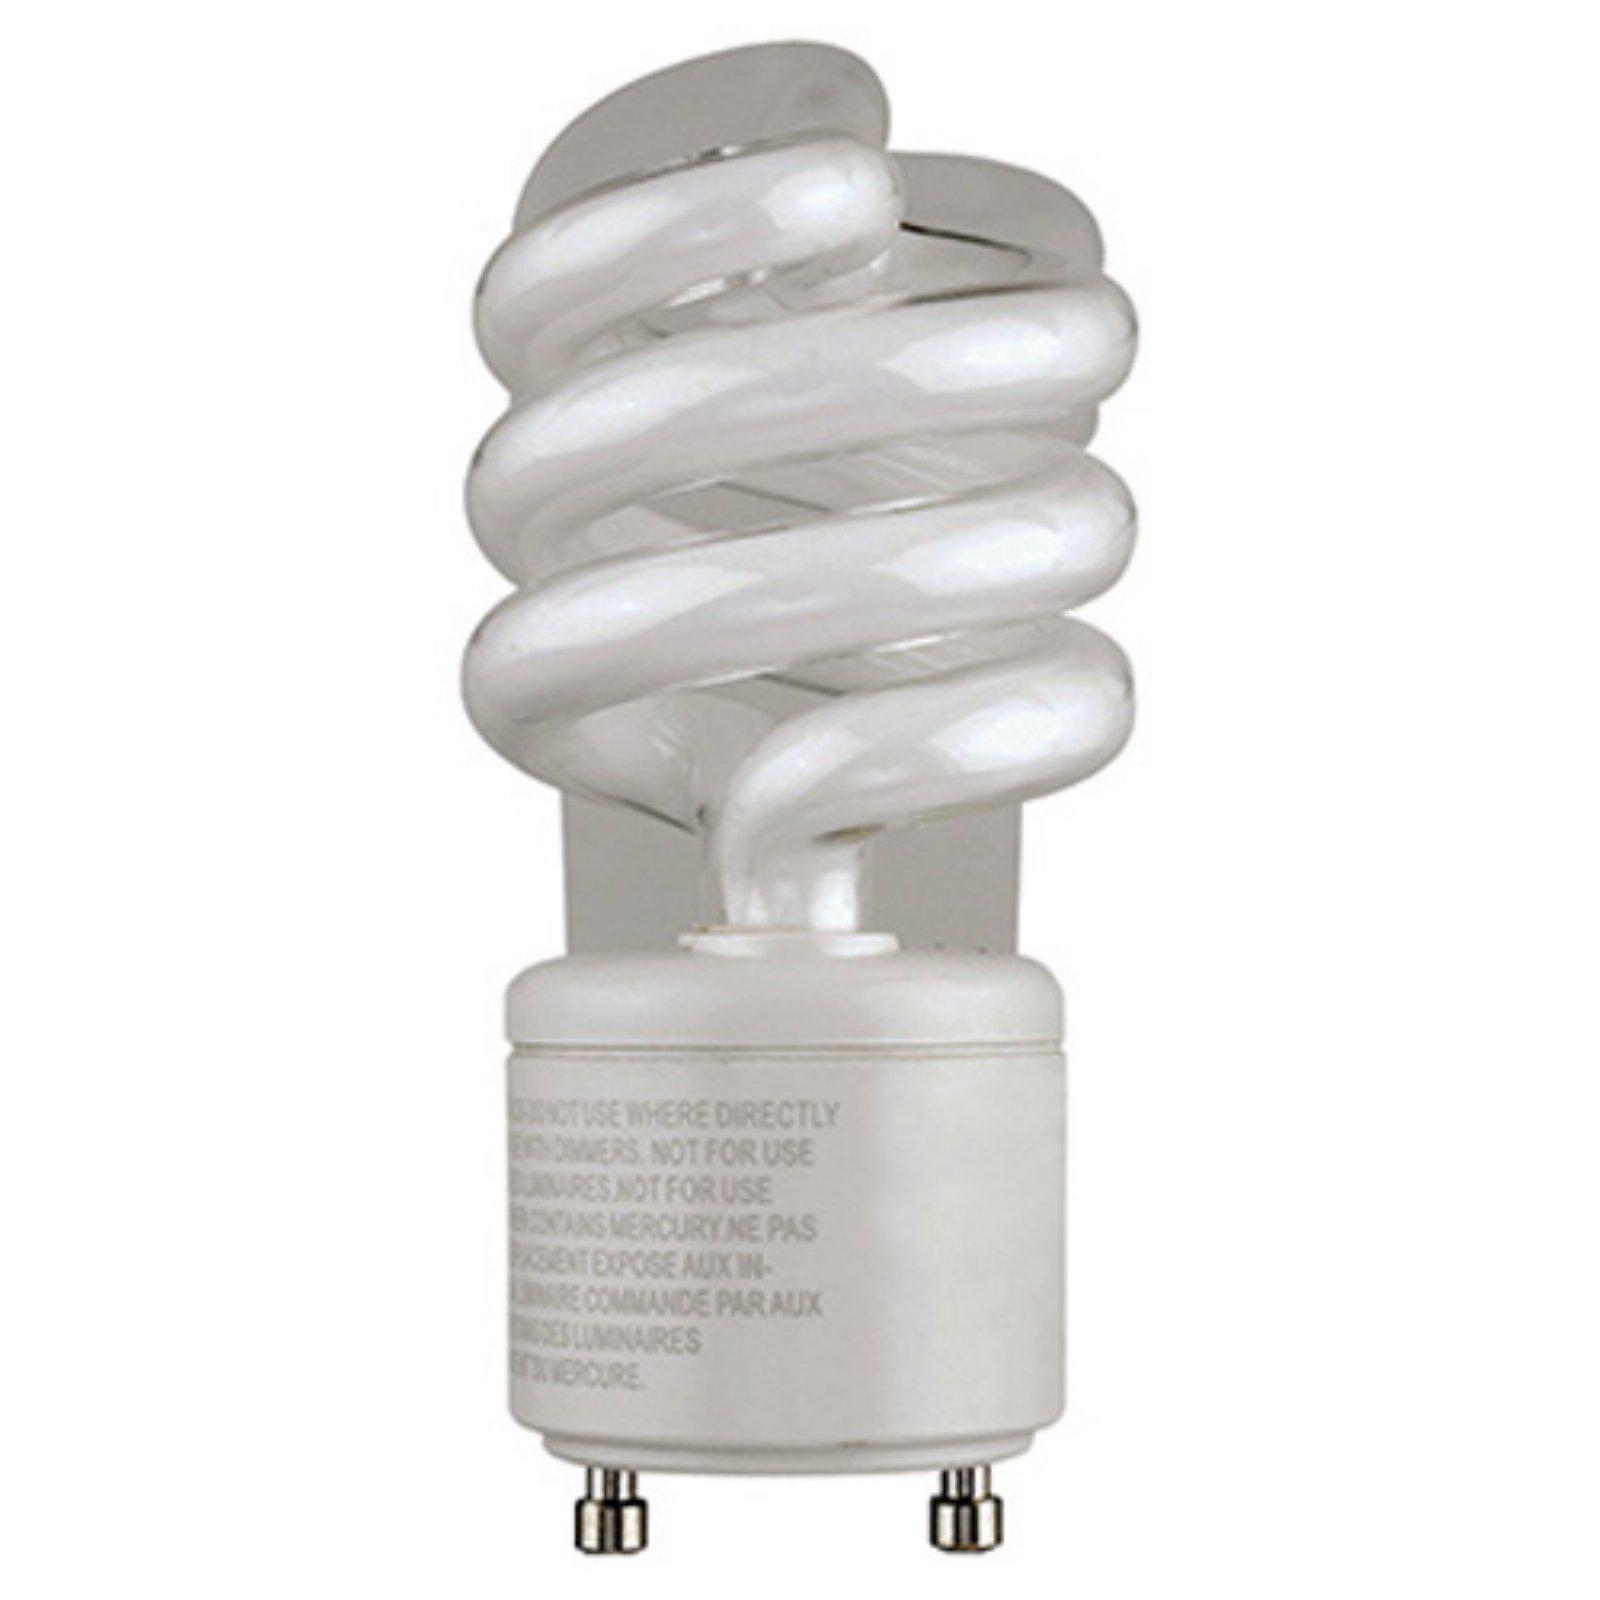 Trans Globe Lighting Gus GU24 Fluorescent Light Bulb - Walmart.com